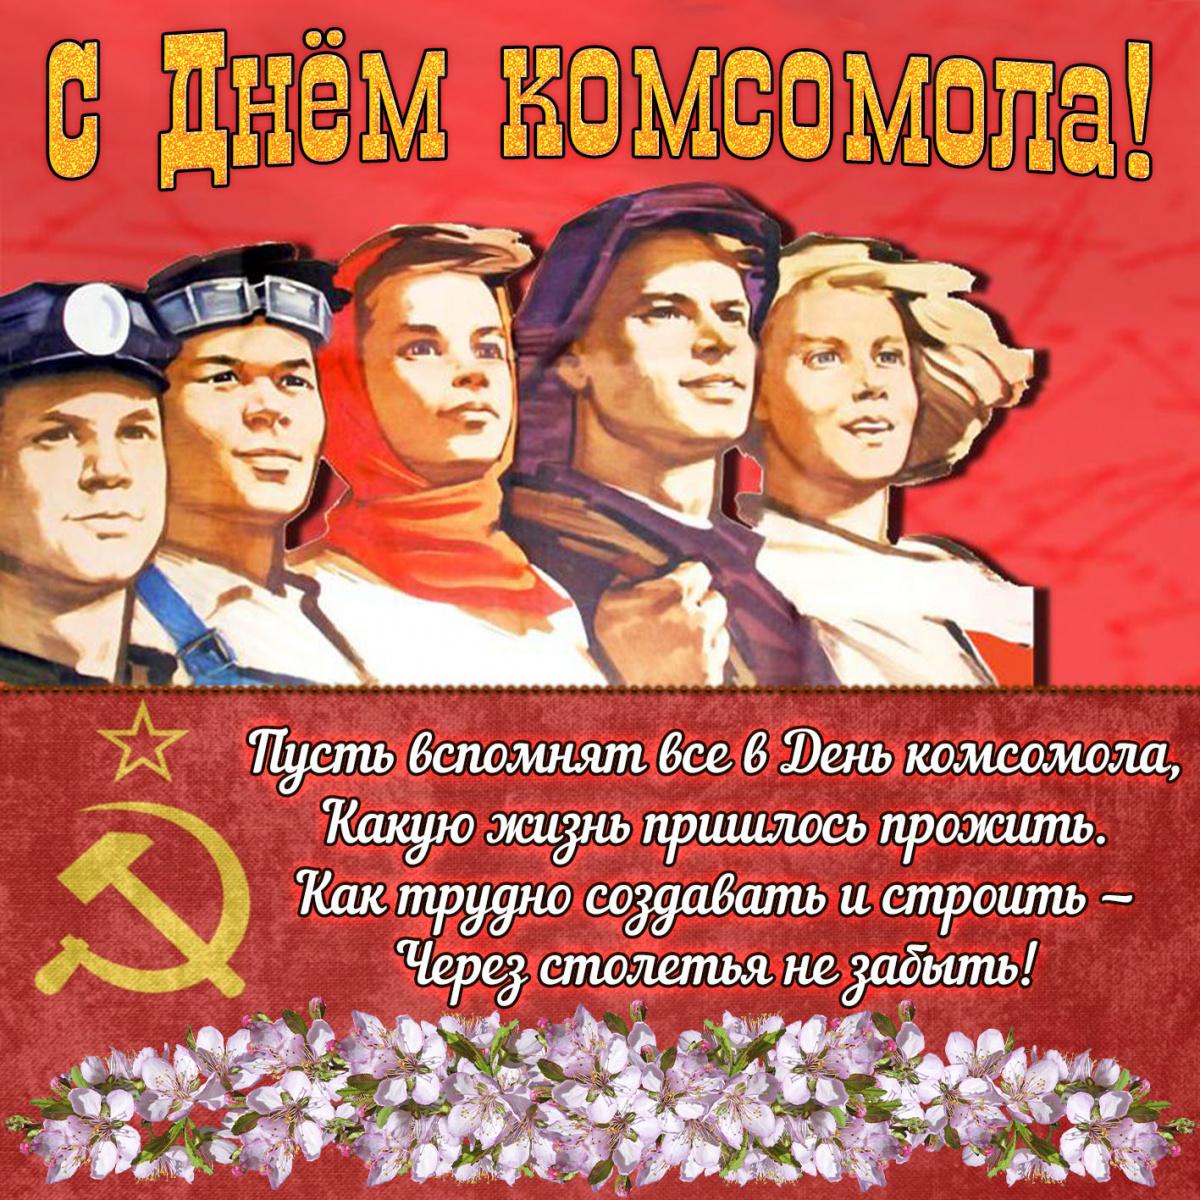 С Днем Комсомола!